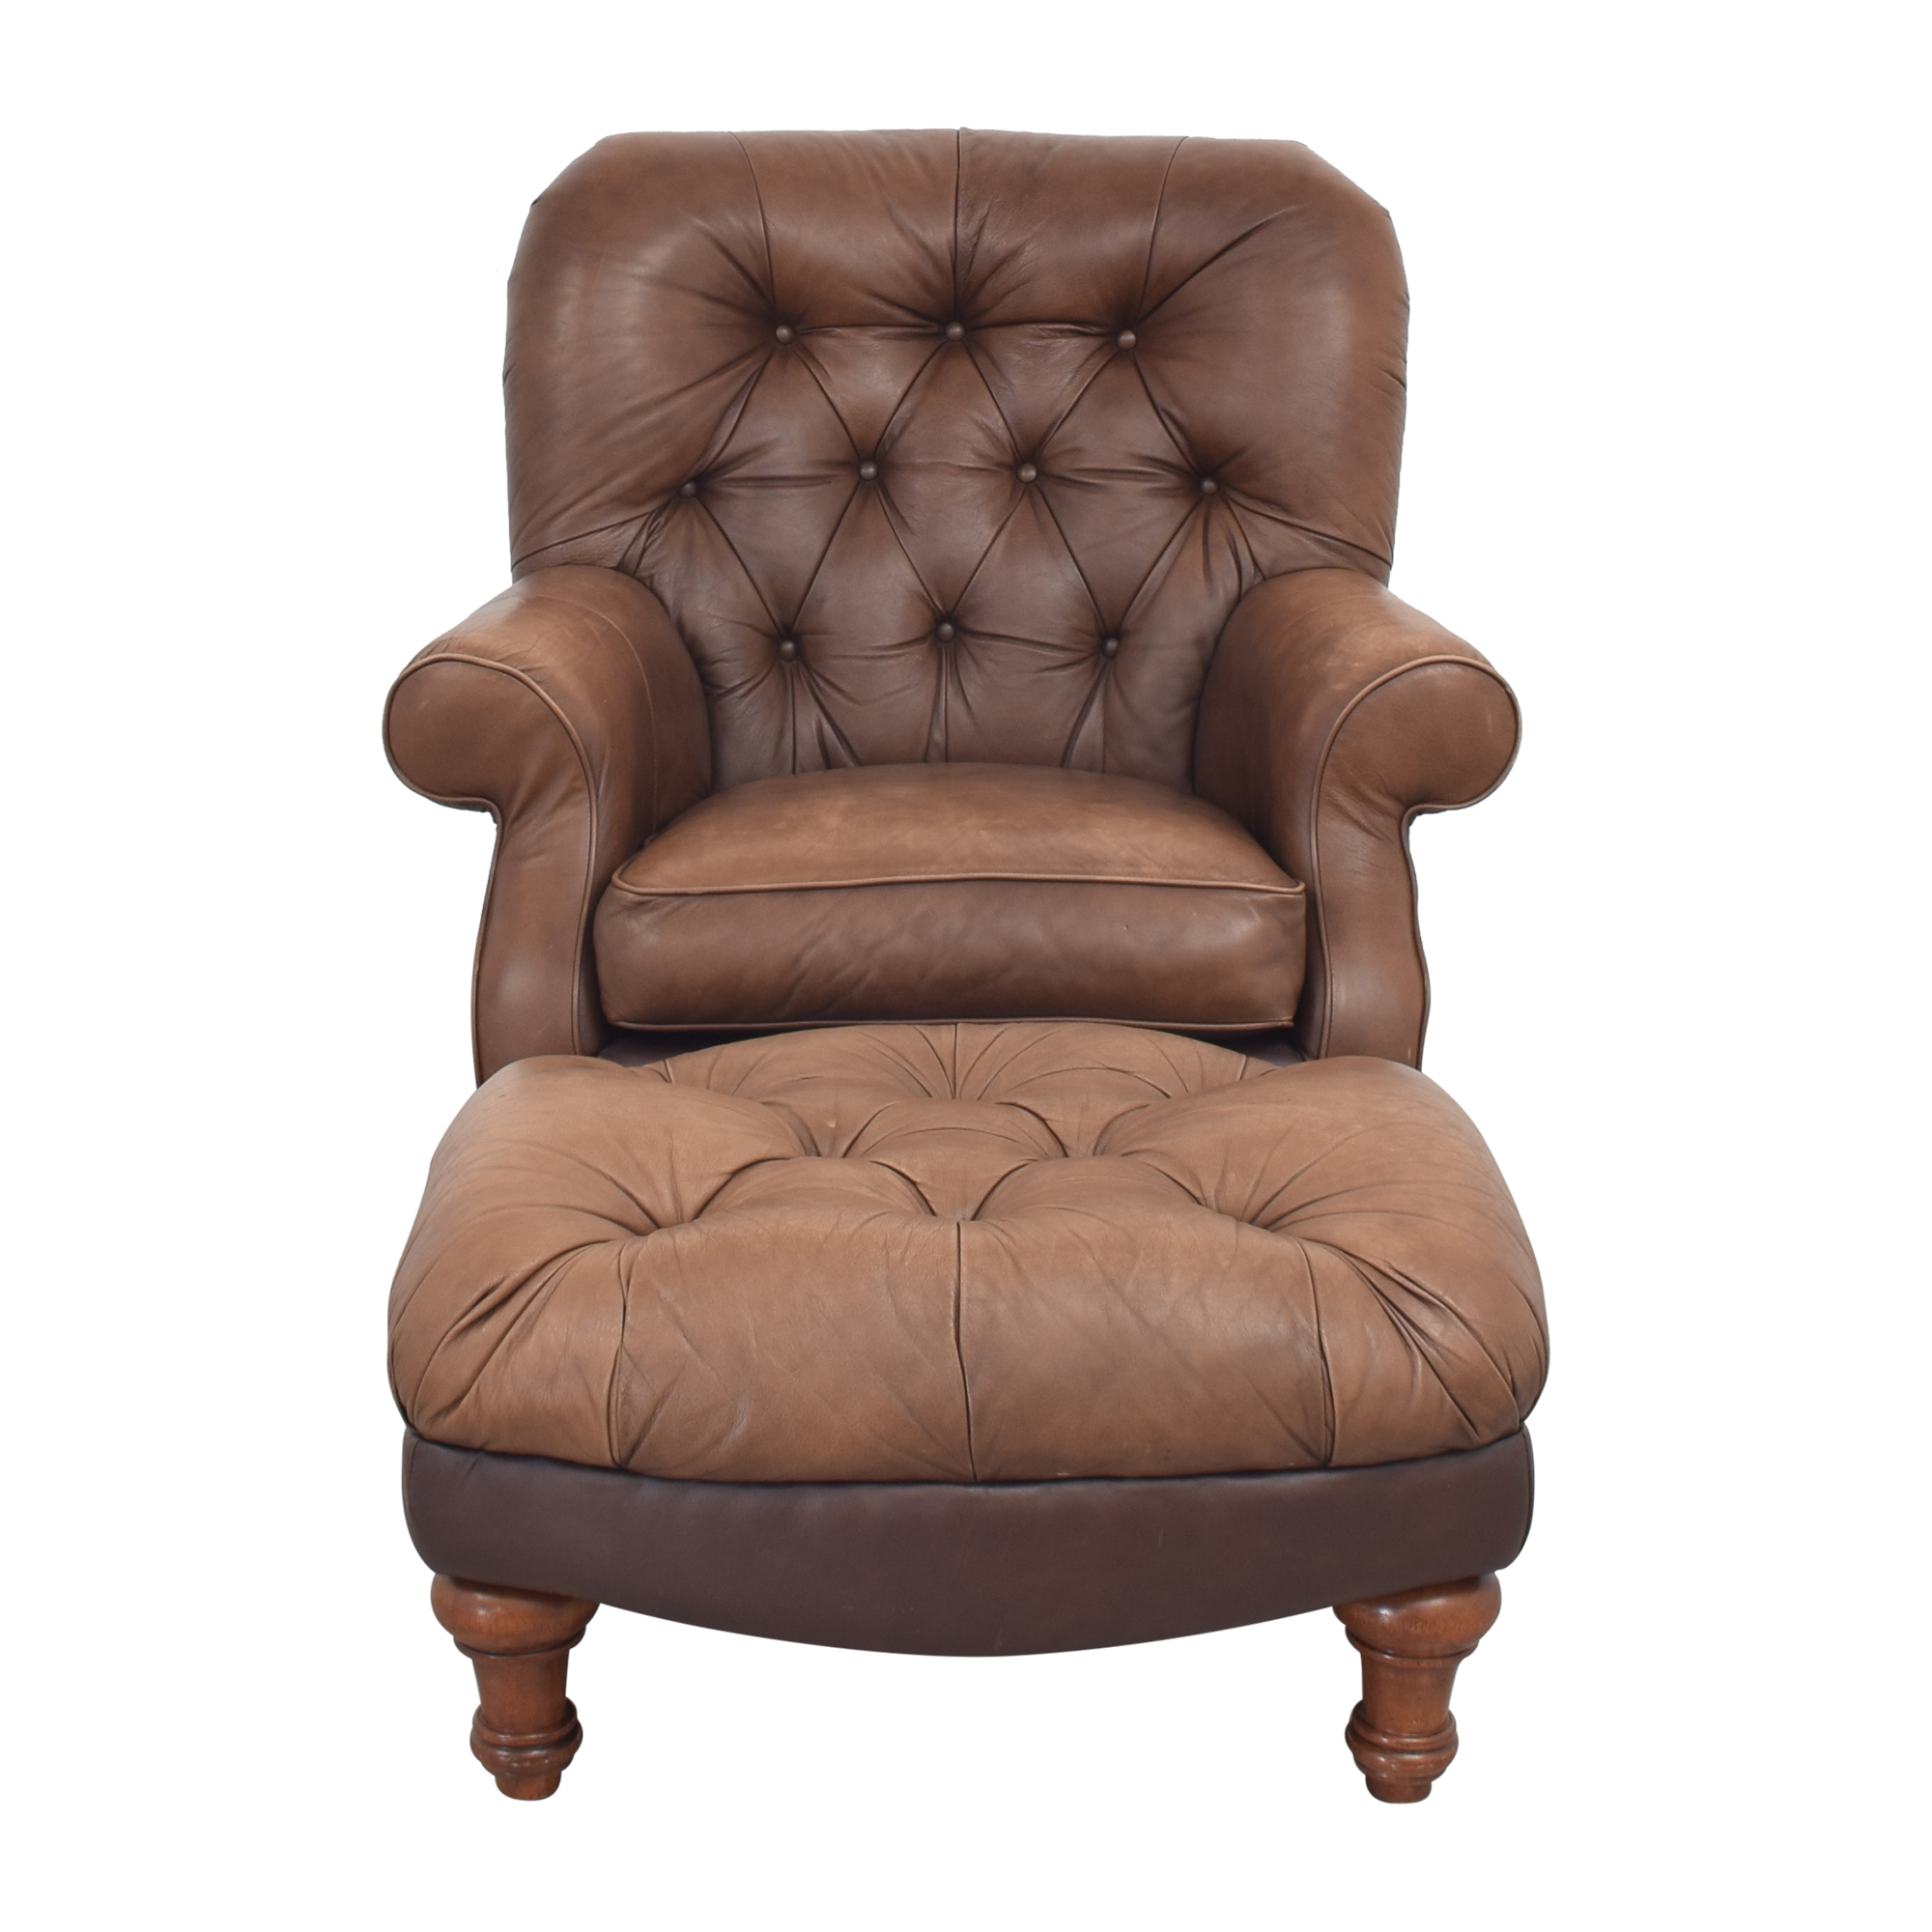 buy La-Z-Boy La-Z-Boy Tufted Chair with Ottoman online